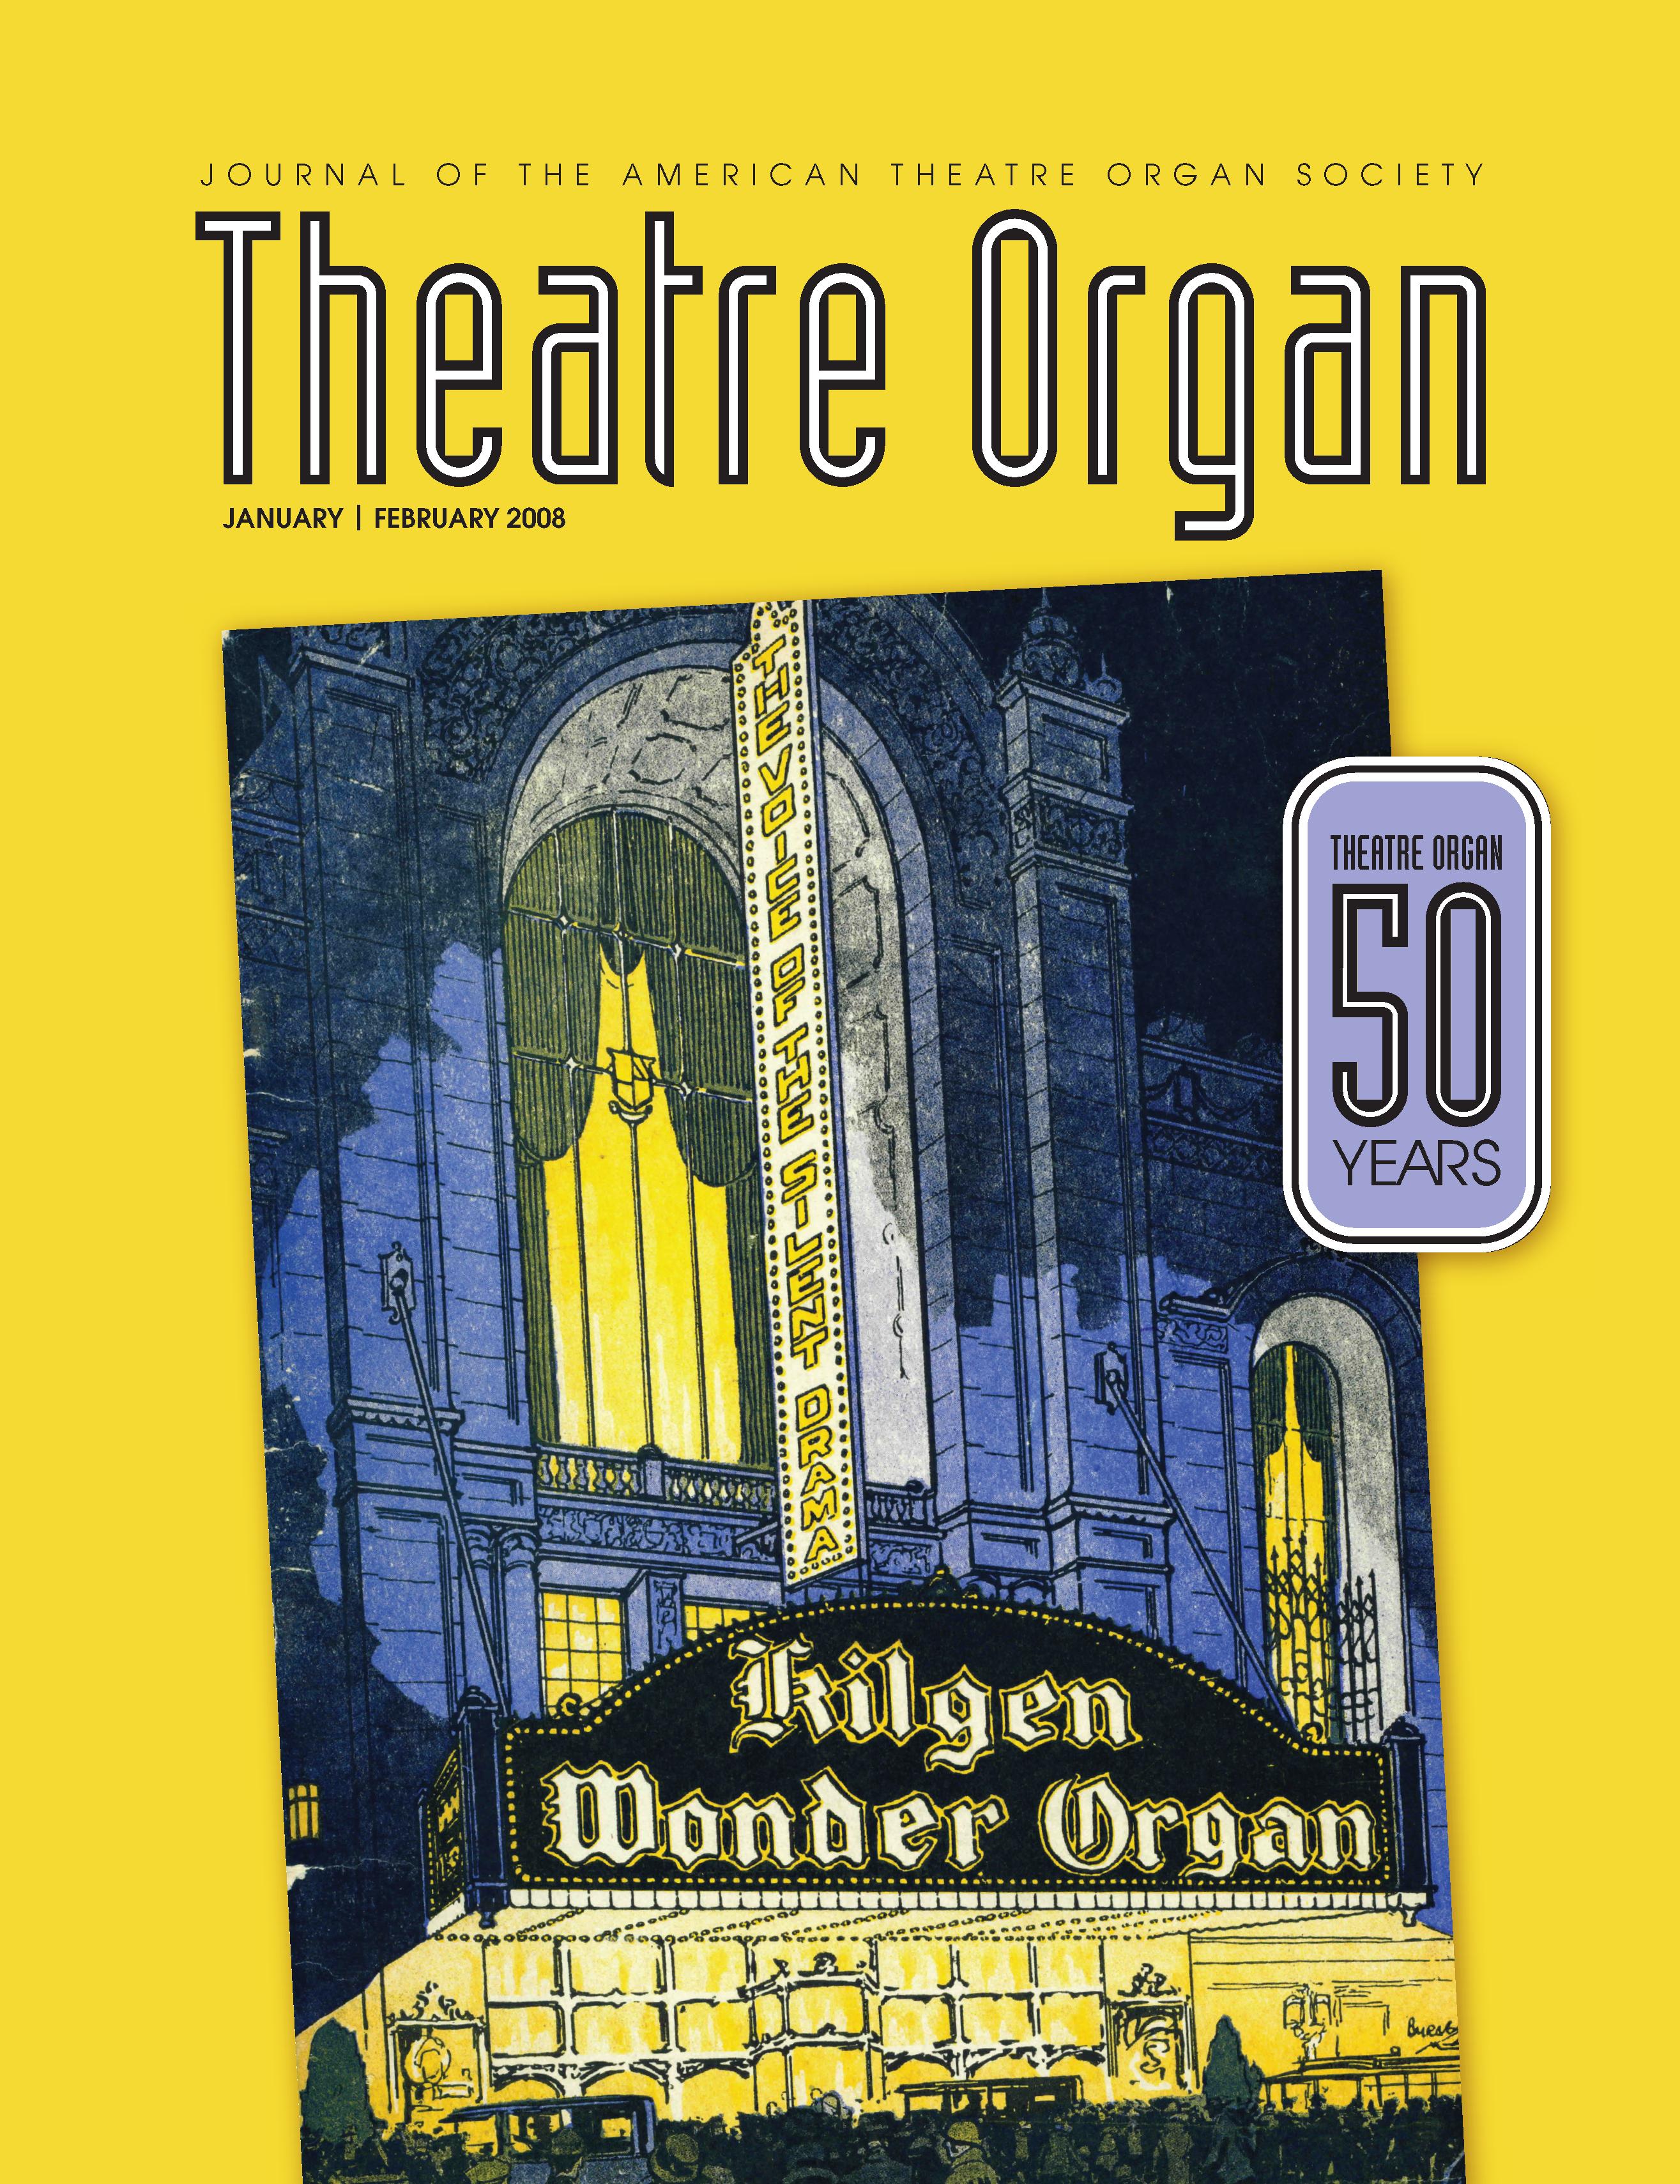 Theatre Organ, January - February 2008, Volume 50, Number 1